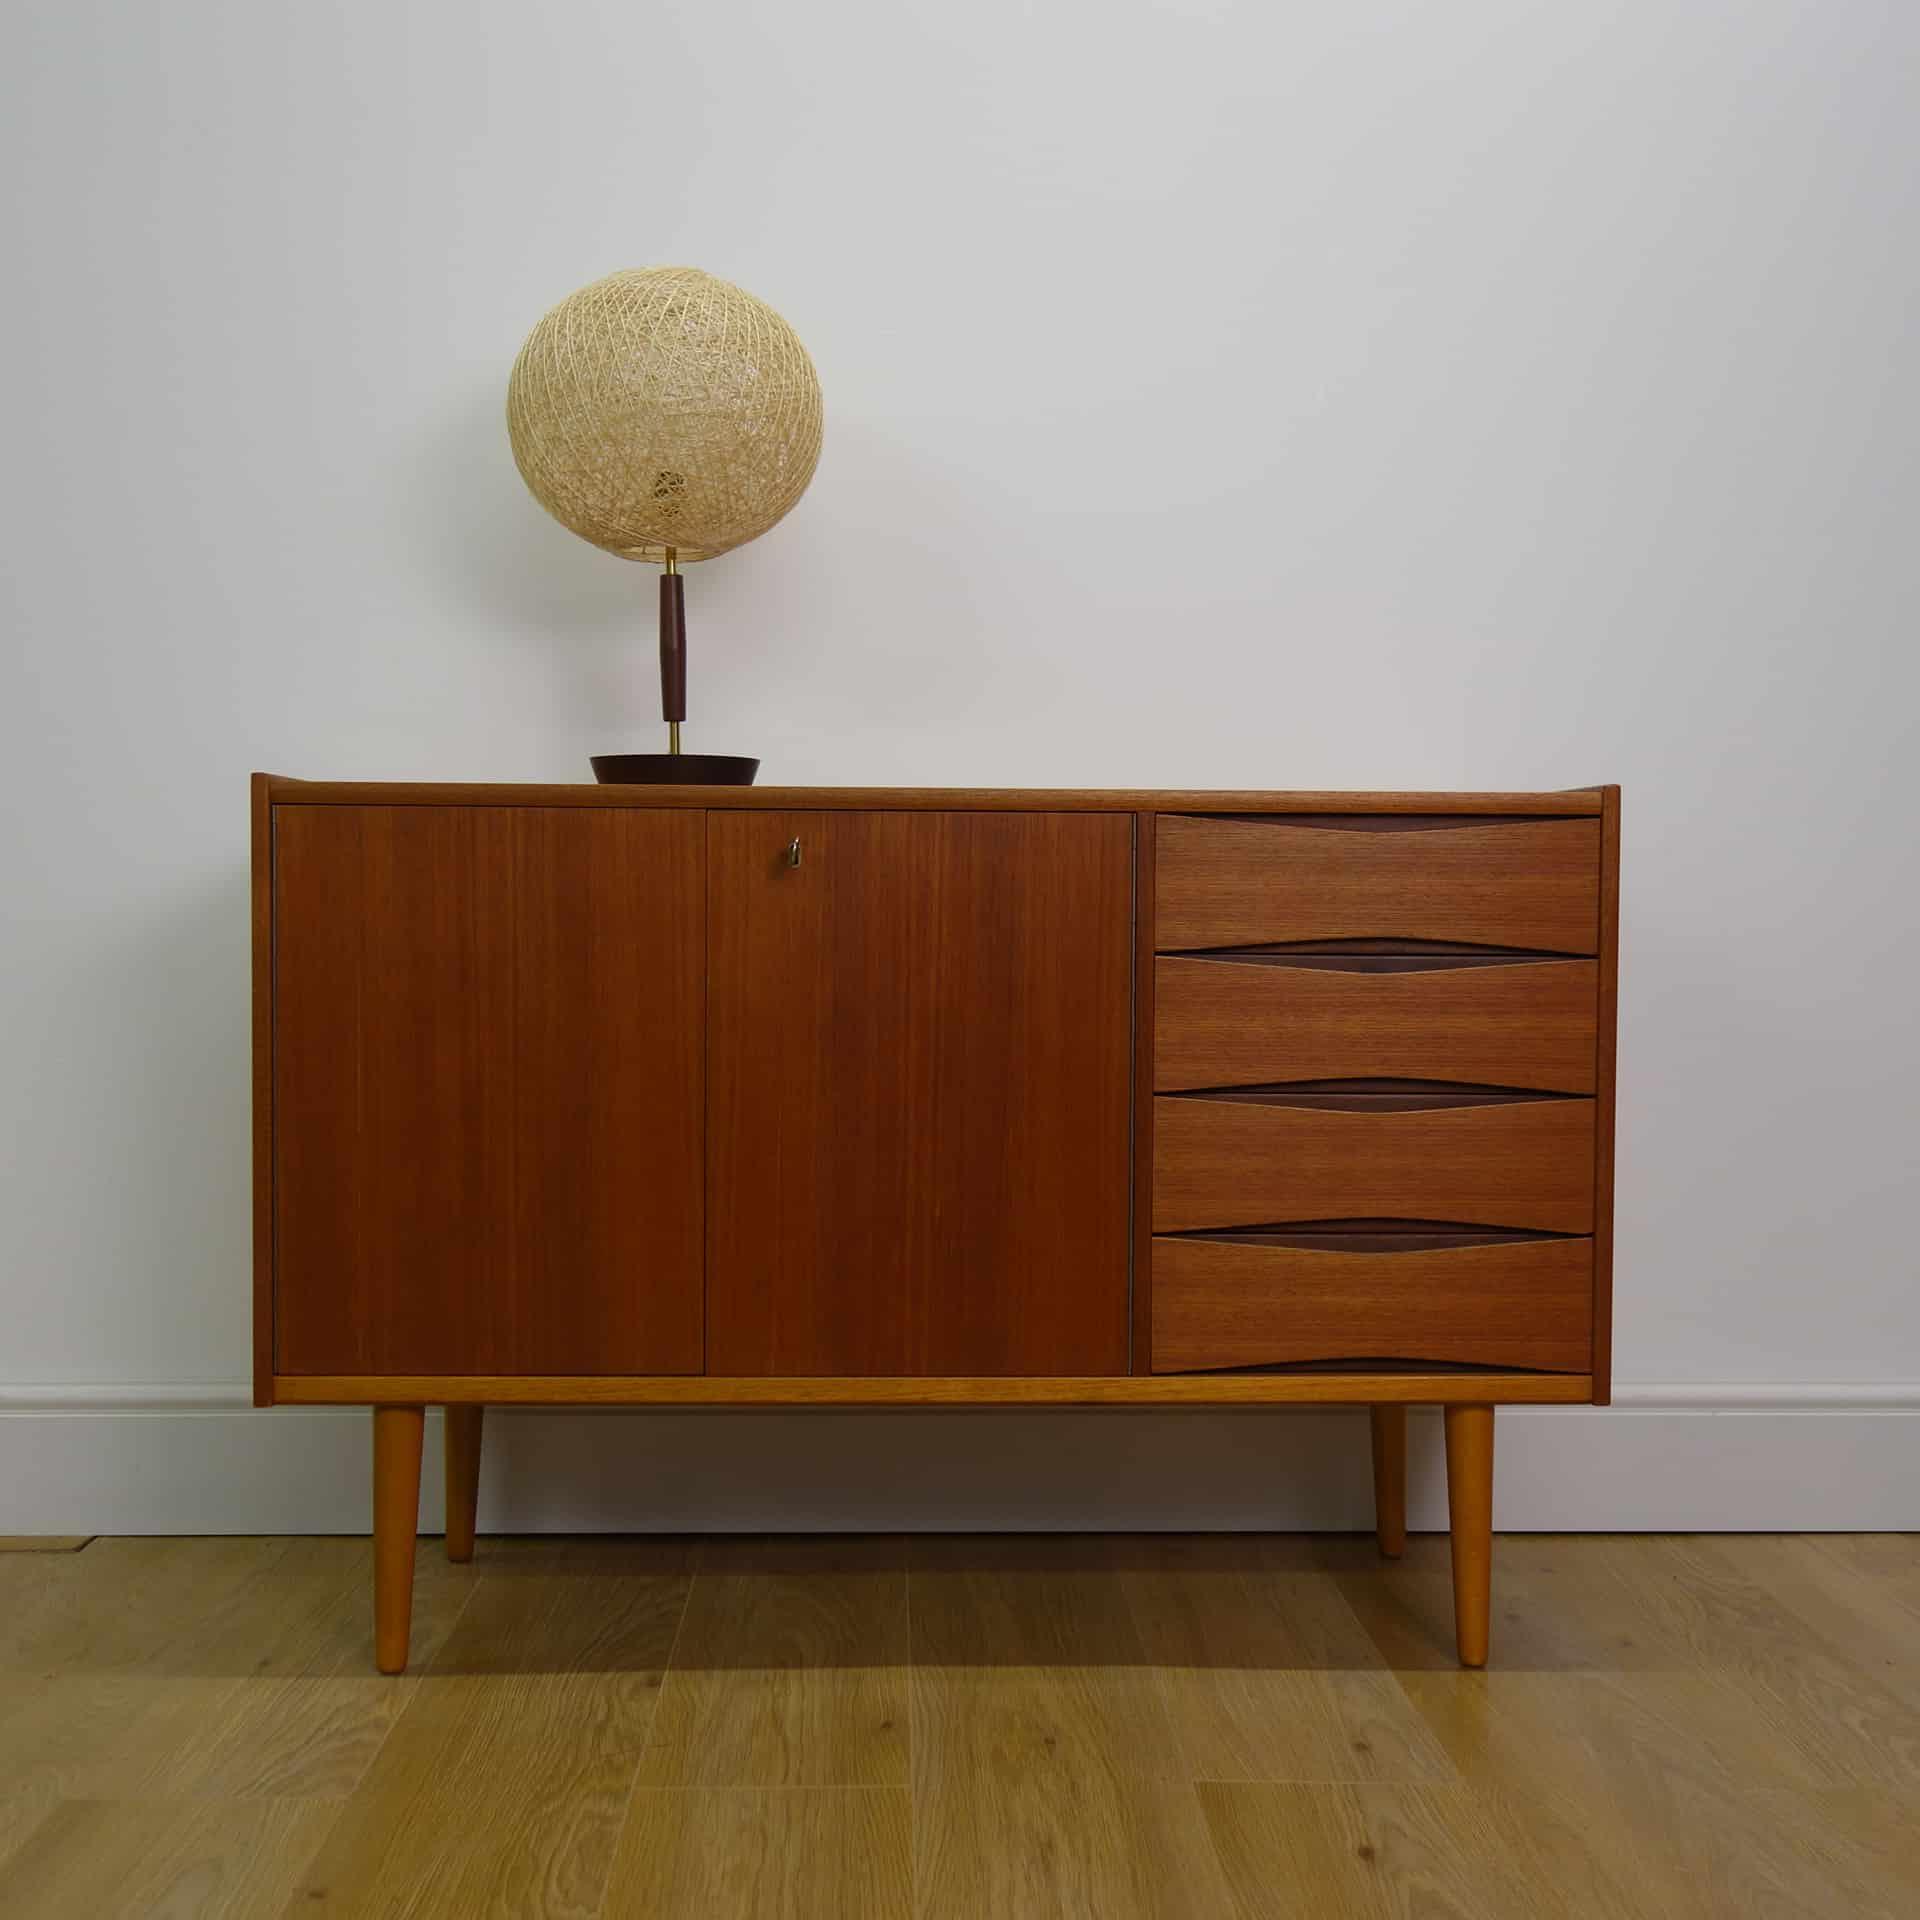 1960s teak and brass table lamp - Mark Parrish Mid Century ...